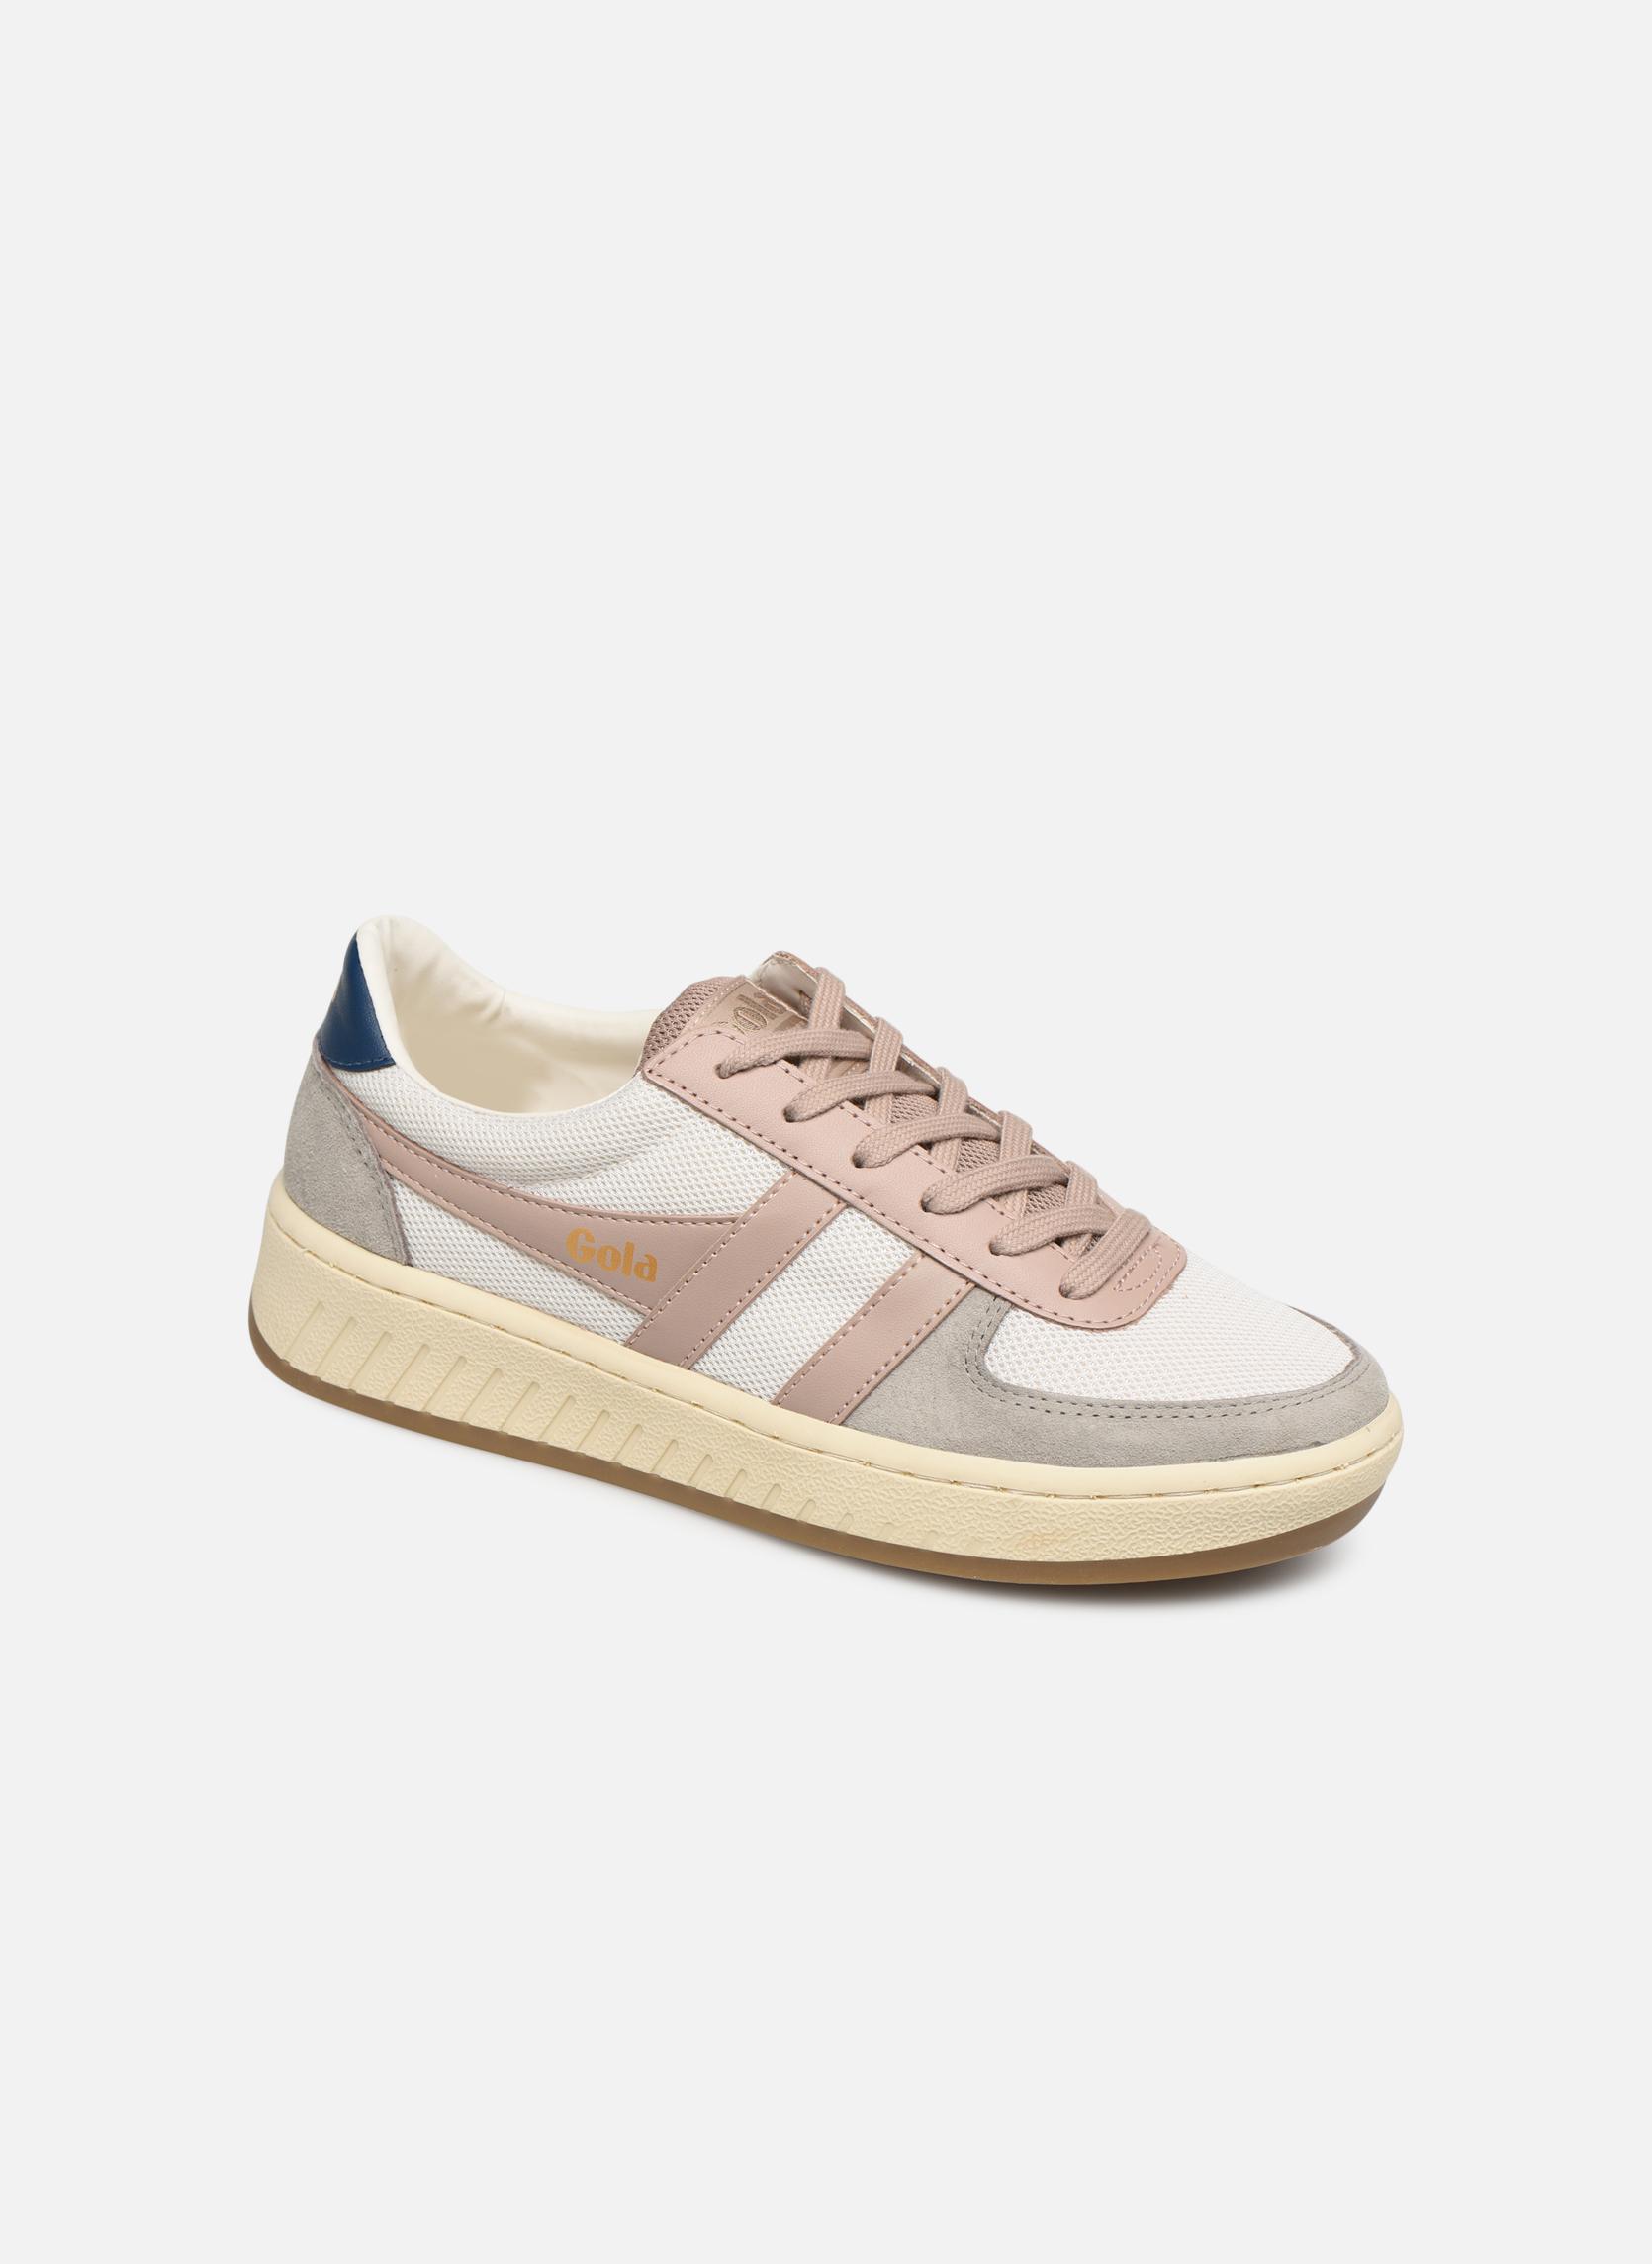 Sneakers Gola Multicolor